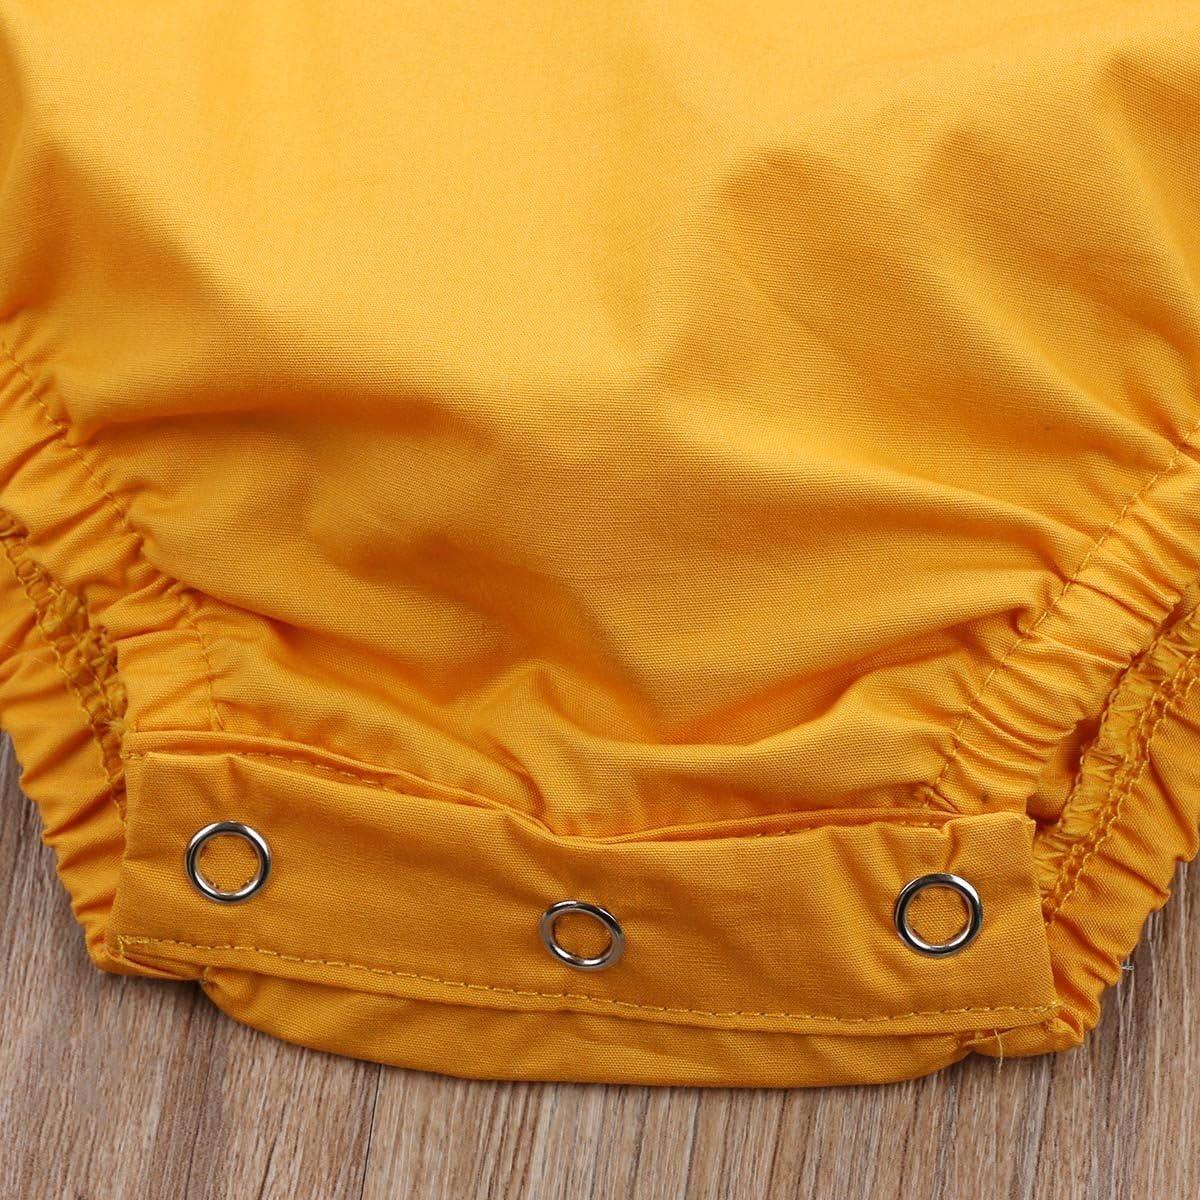 Floral Newborn Kid Baby Girl Infant Romper Jumpsuit Bodysuit Clothes Outfit 0-24 M